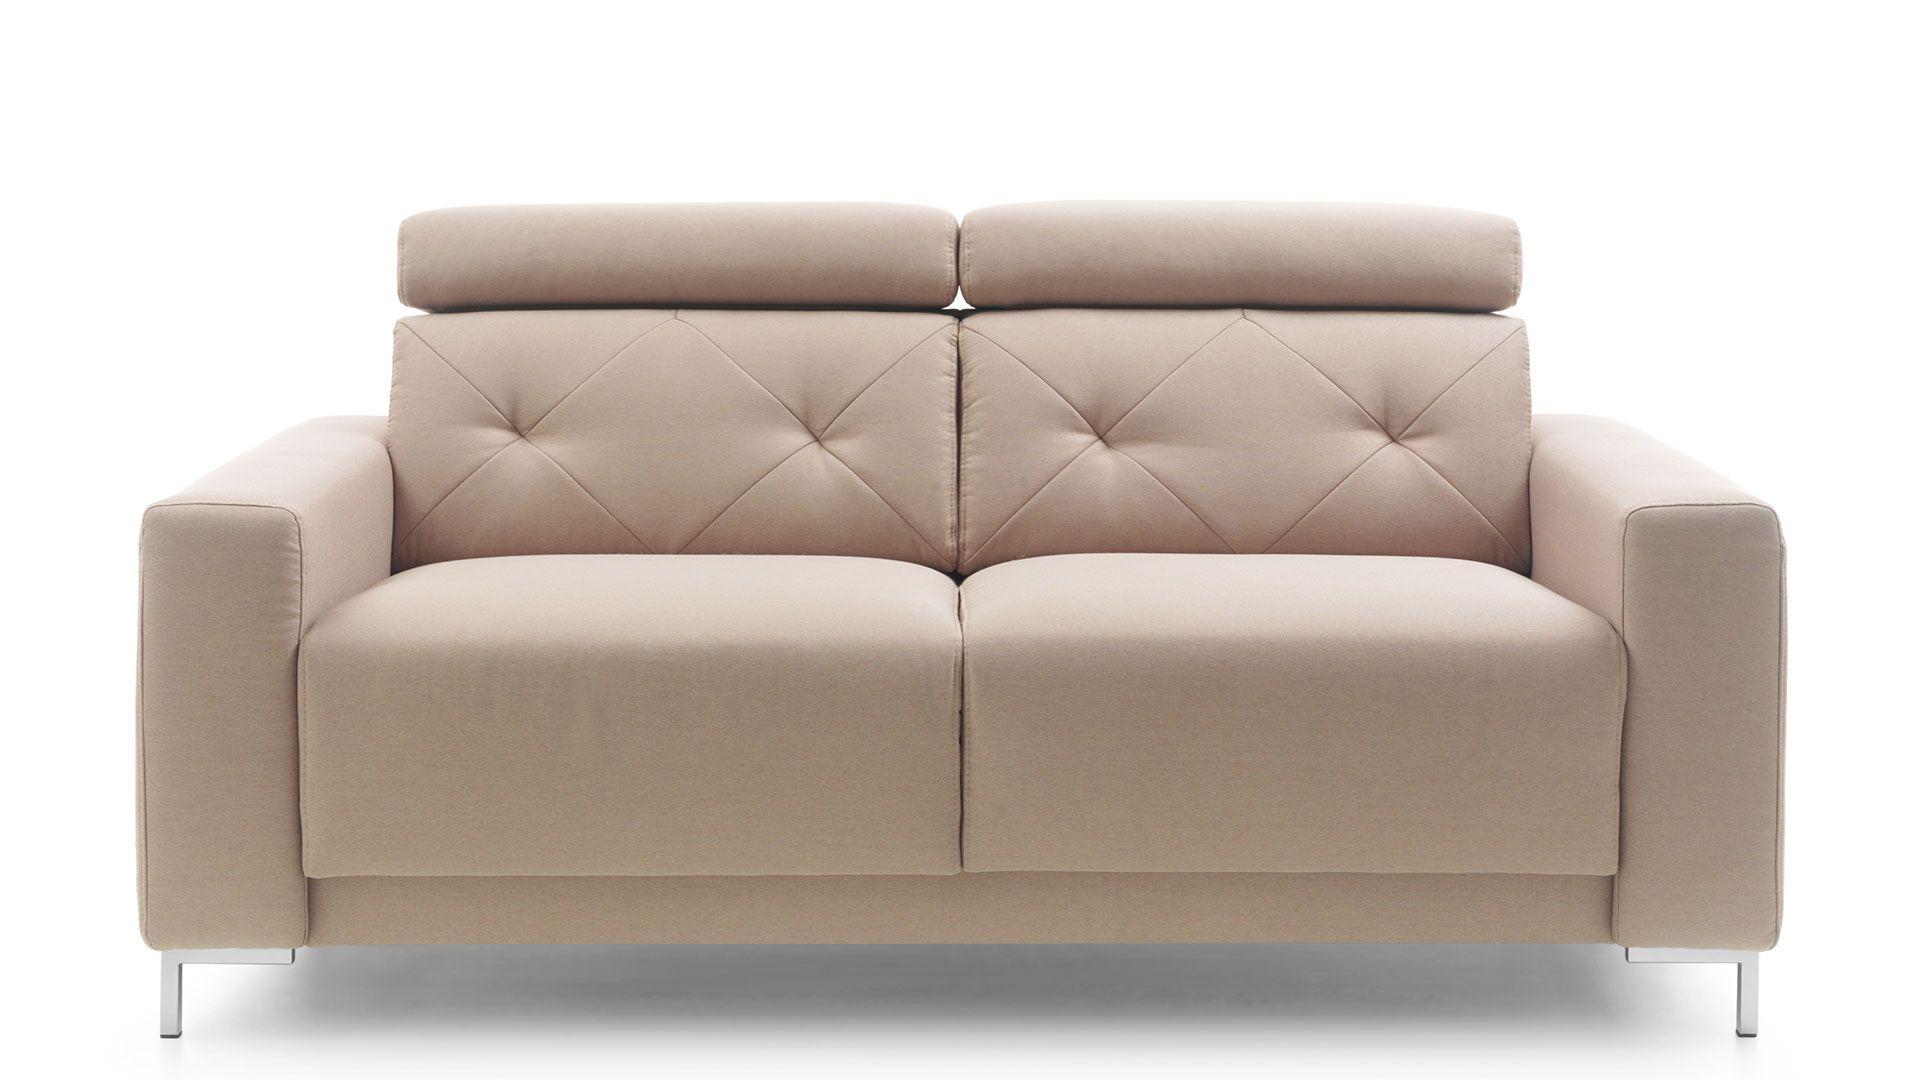 Sofa Life